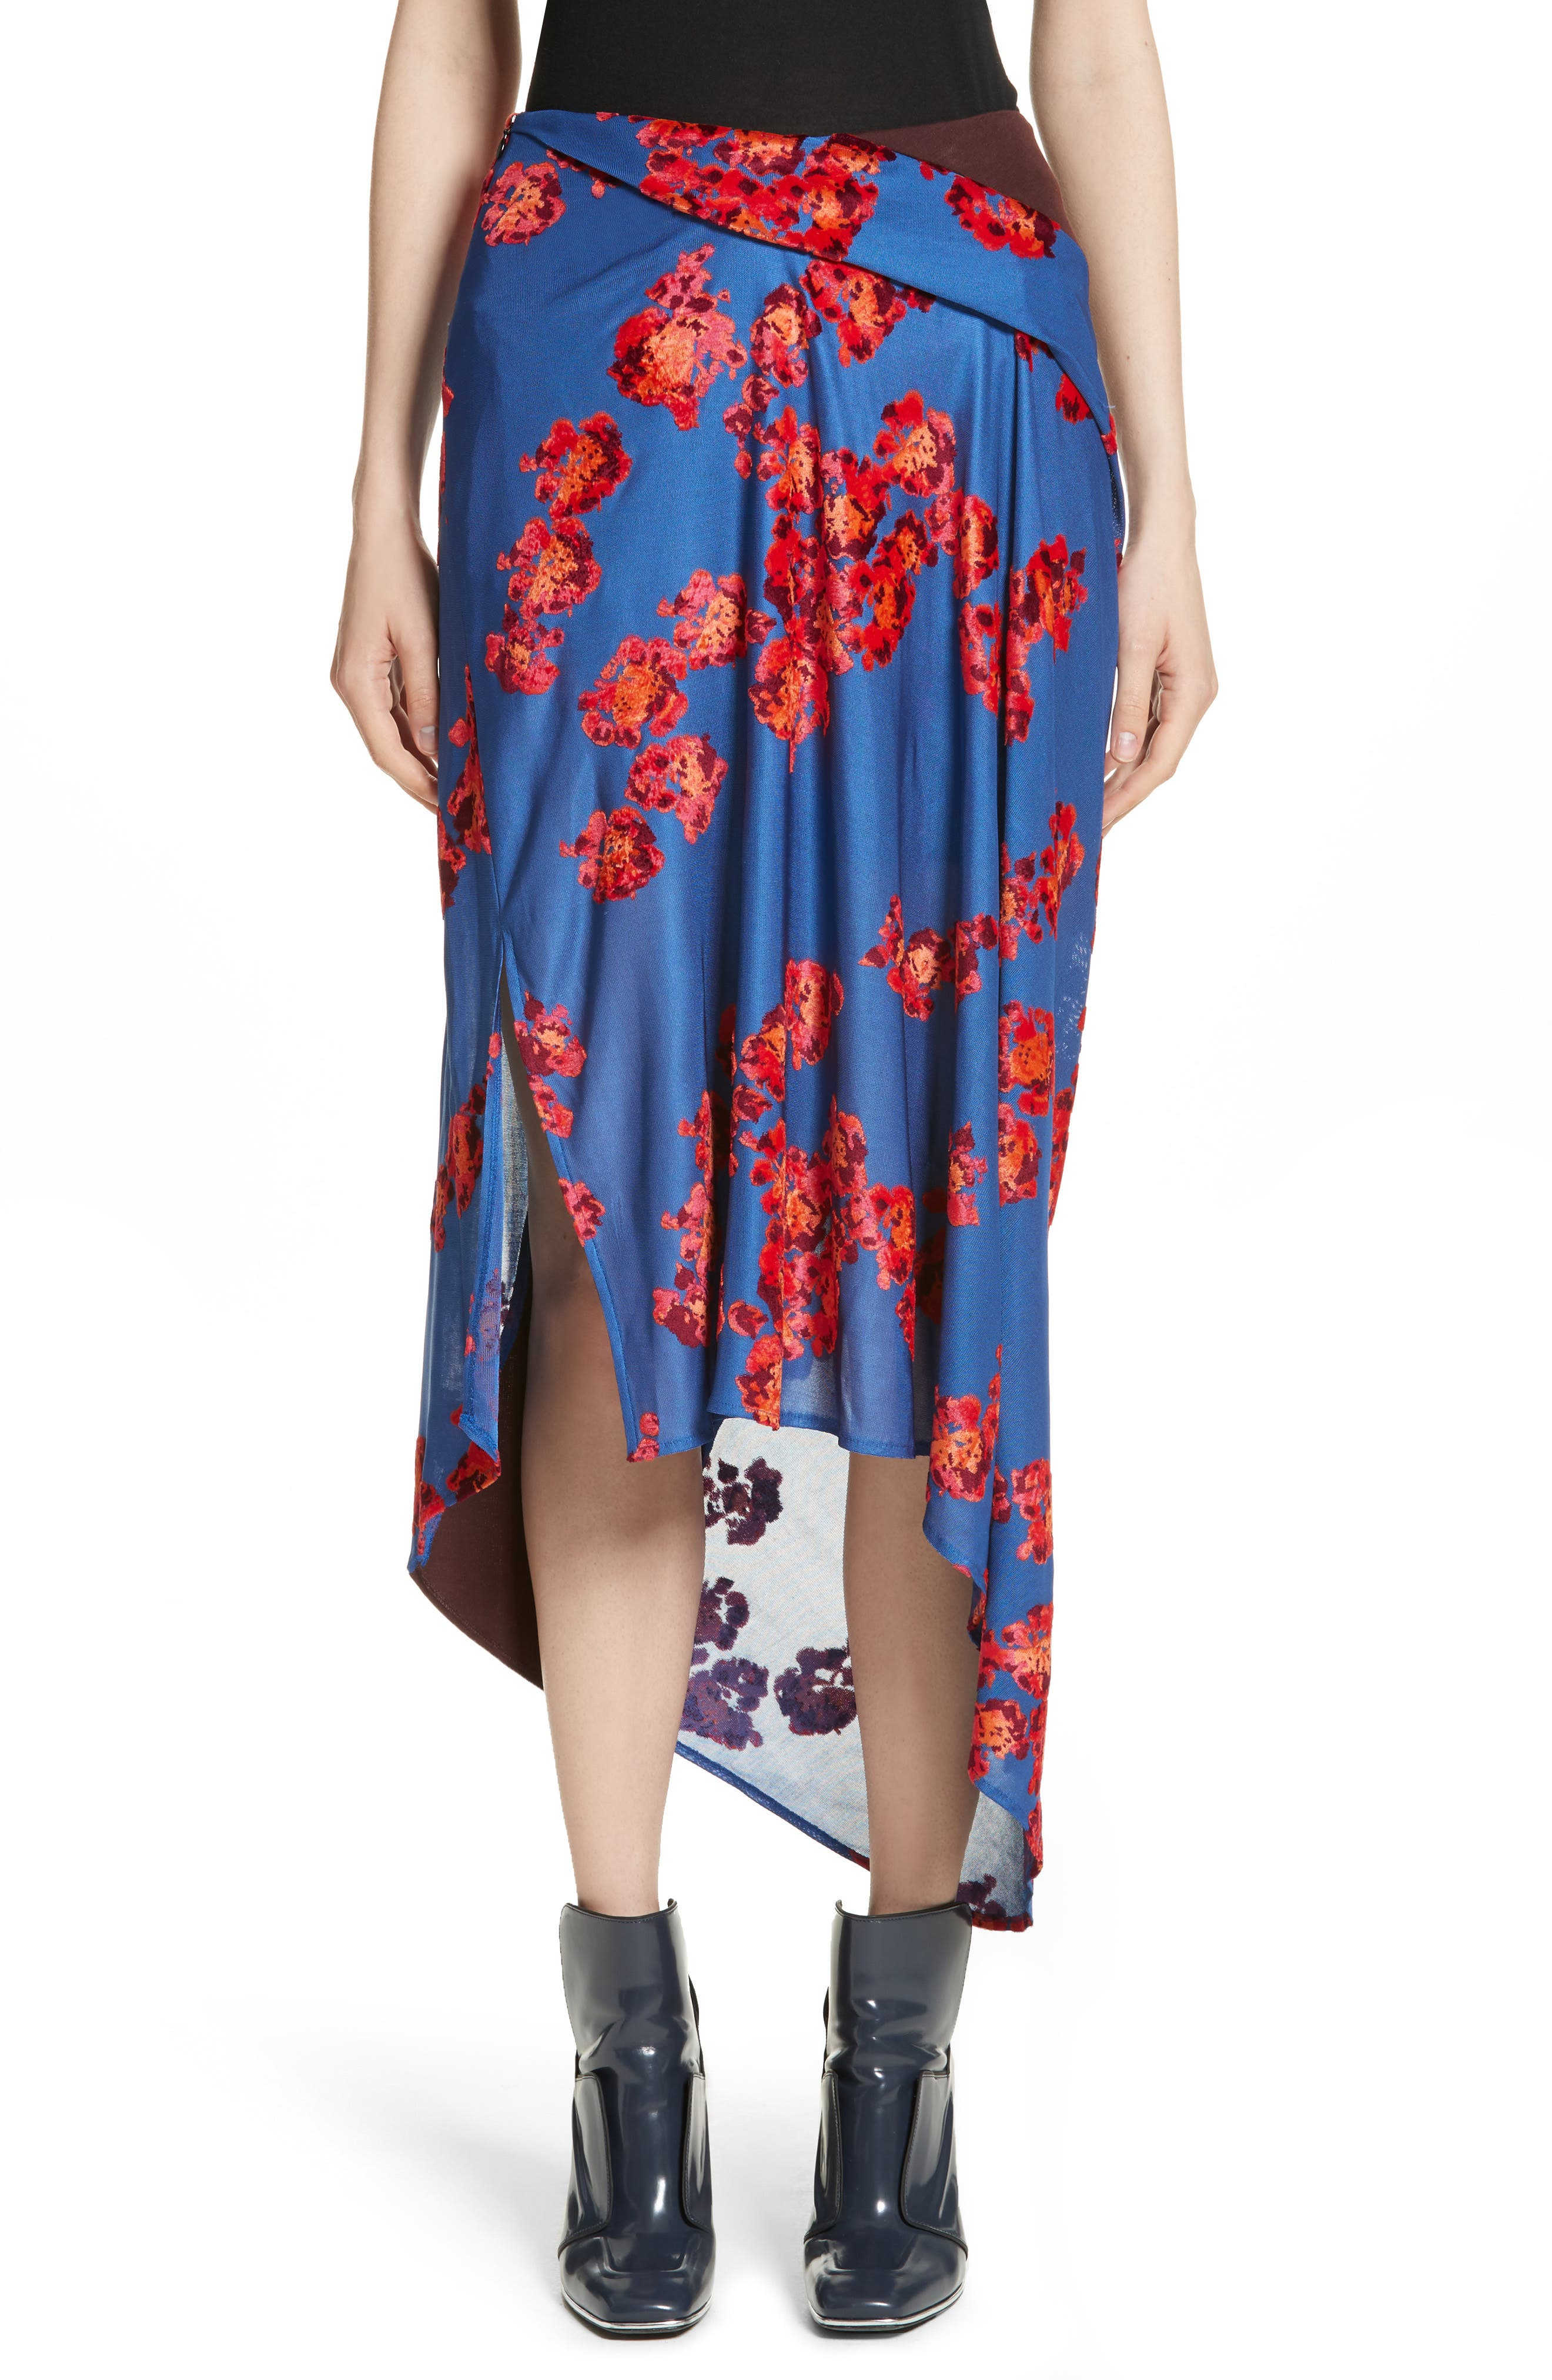 Atlein Jacquard Jersey Asymmetrical Skirt